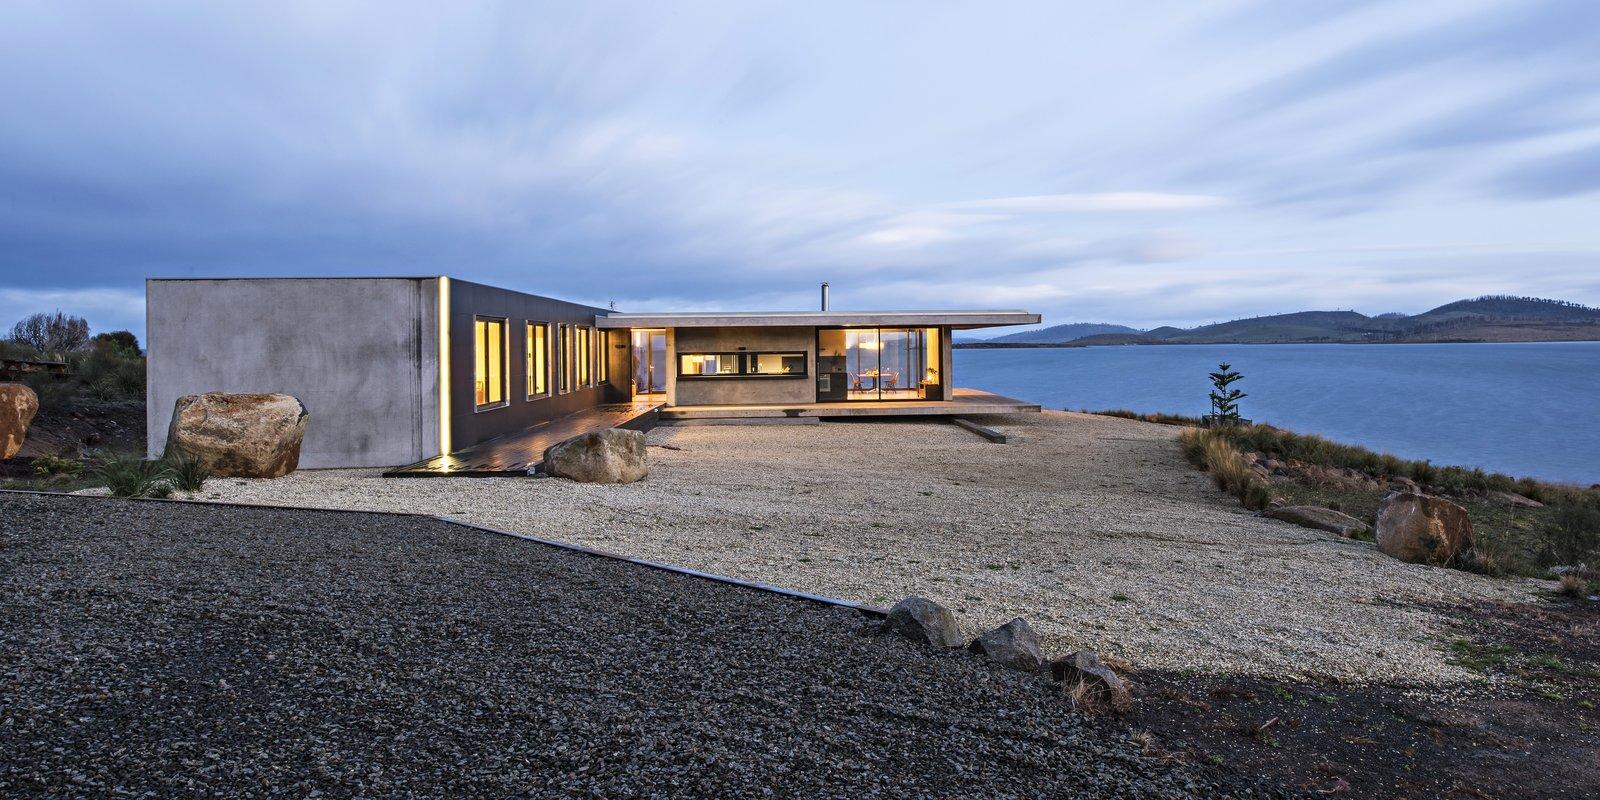 A Semi-Modular Beach House in Tasmania Floats Over a Site That Survived a Bushfire